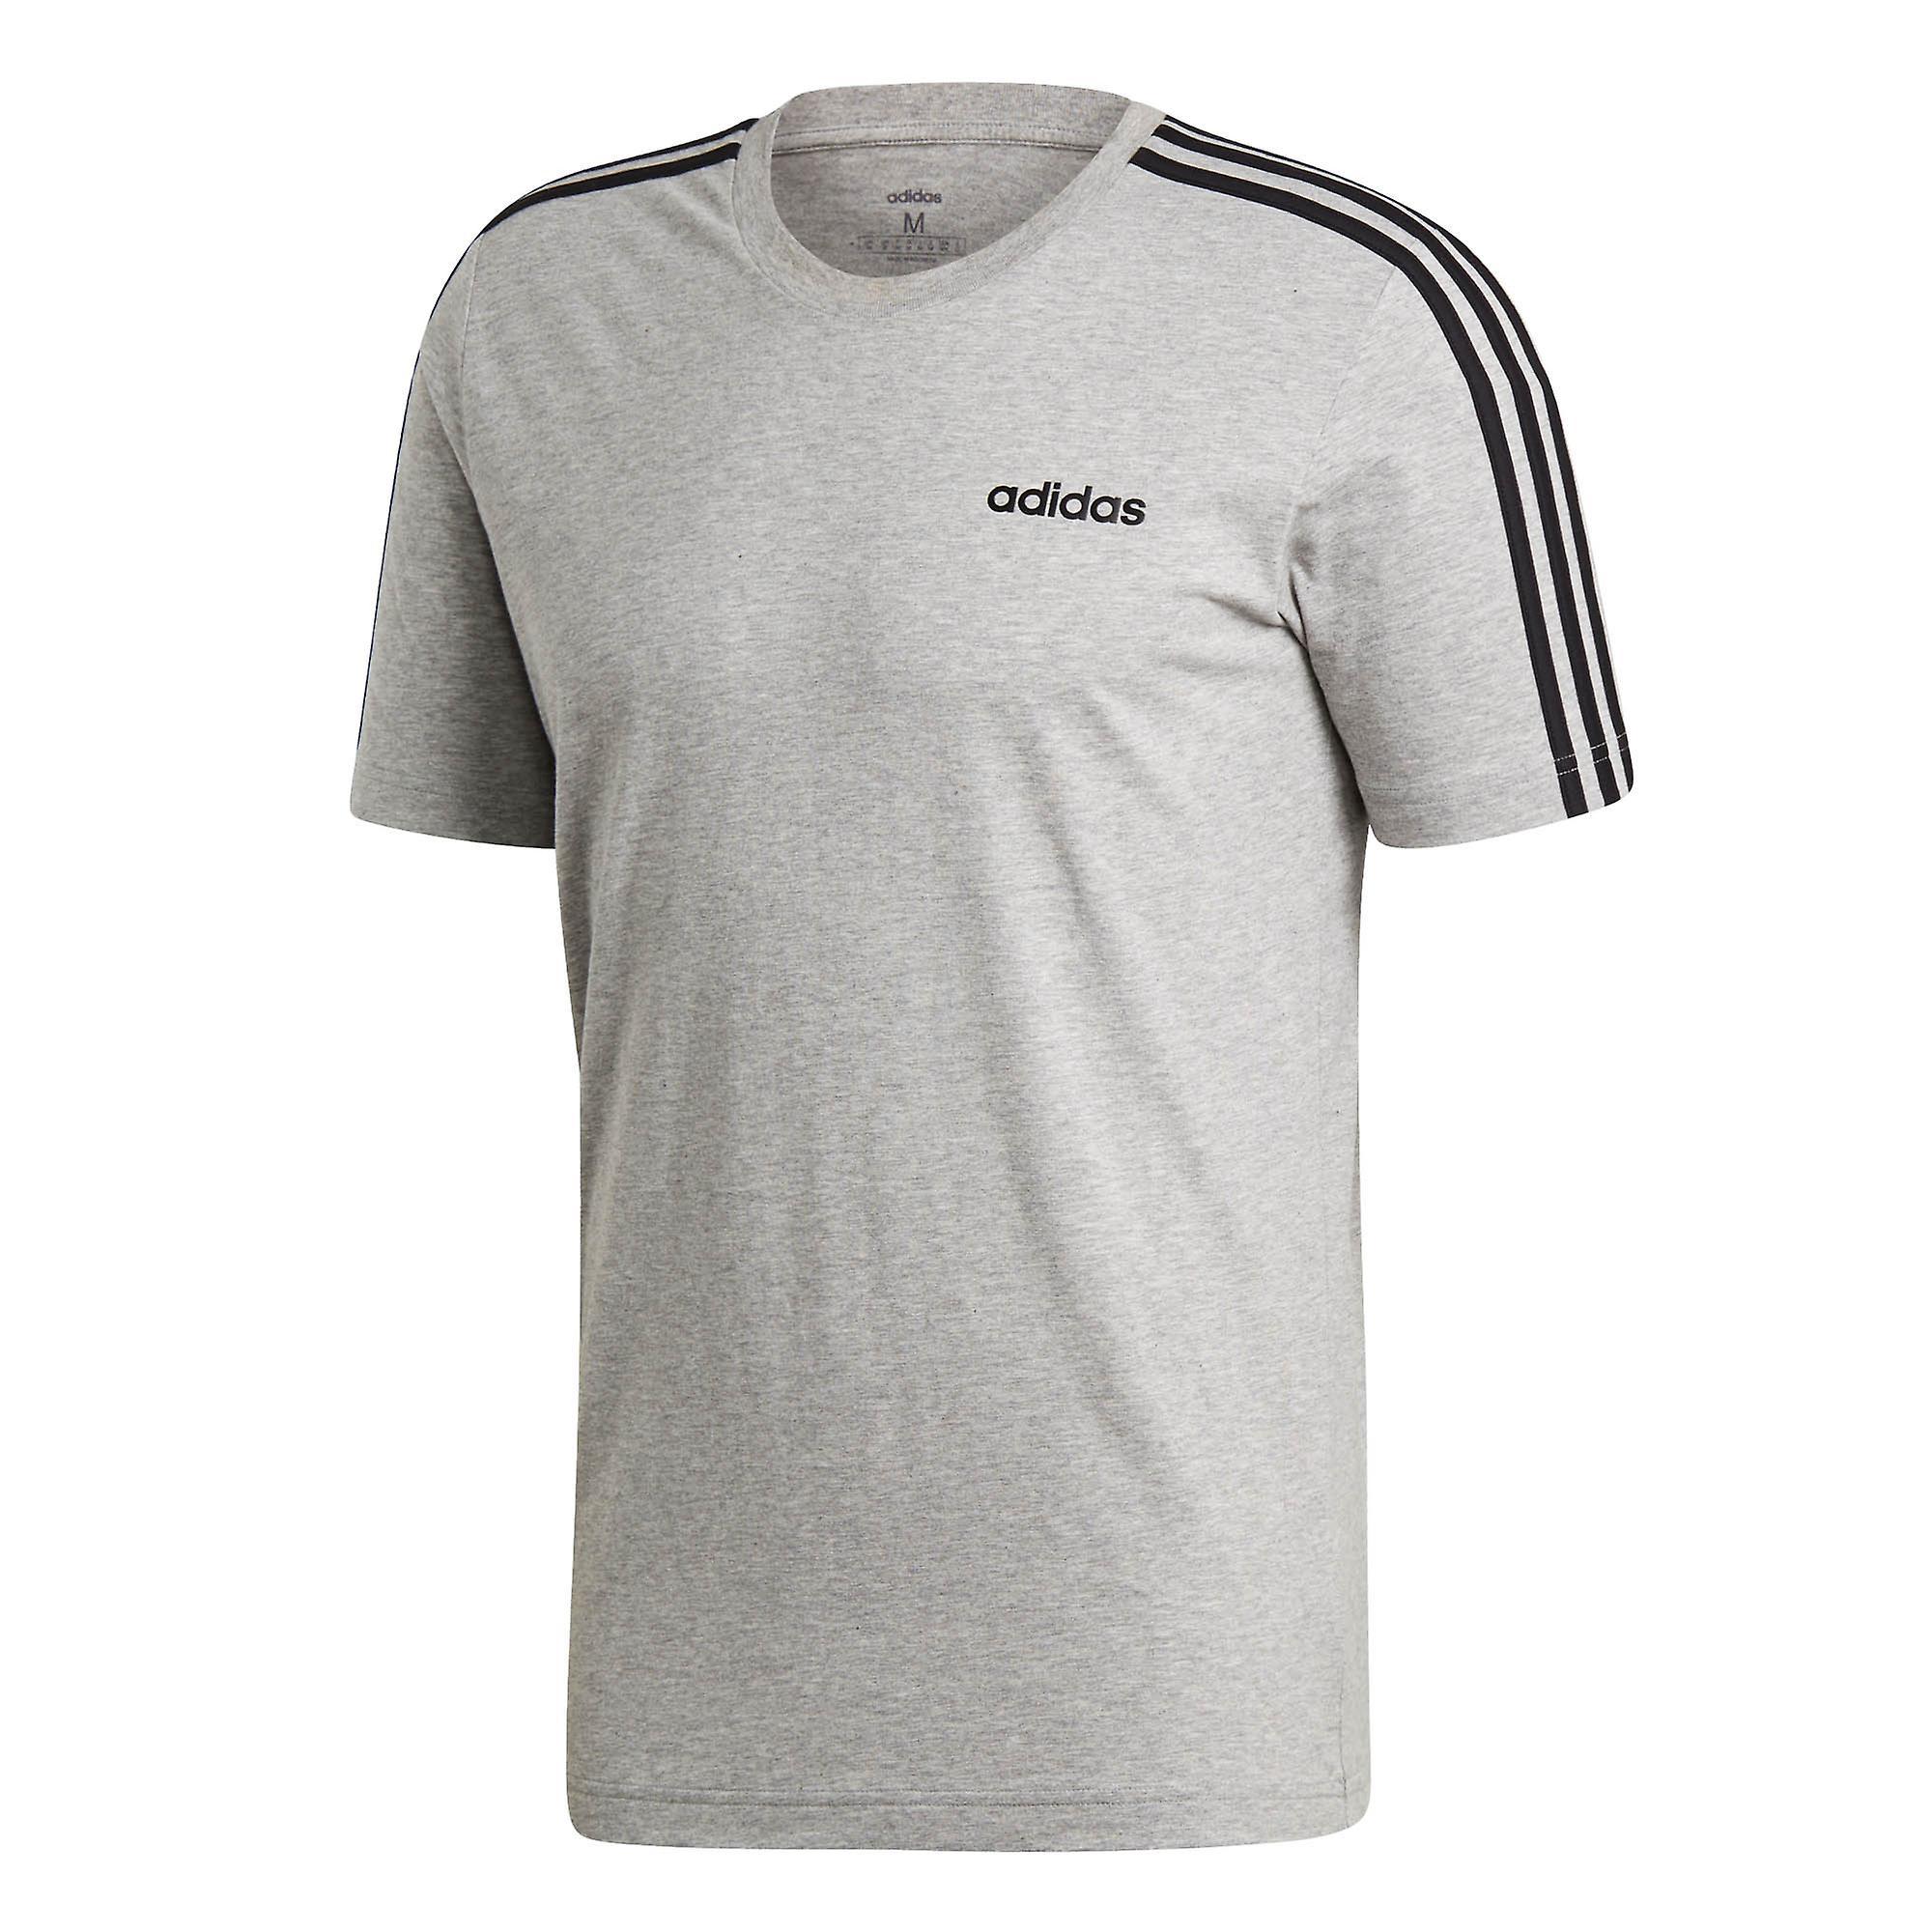 adidas Essential 3-Stripe Mens Cotton Sport Training T-Shirt Tee Grey/Black